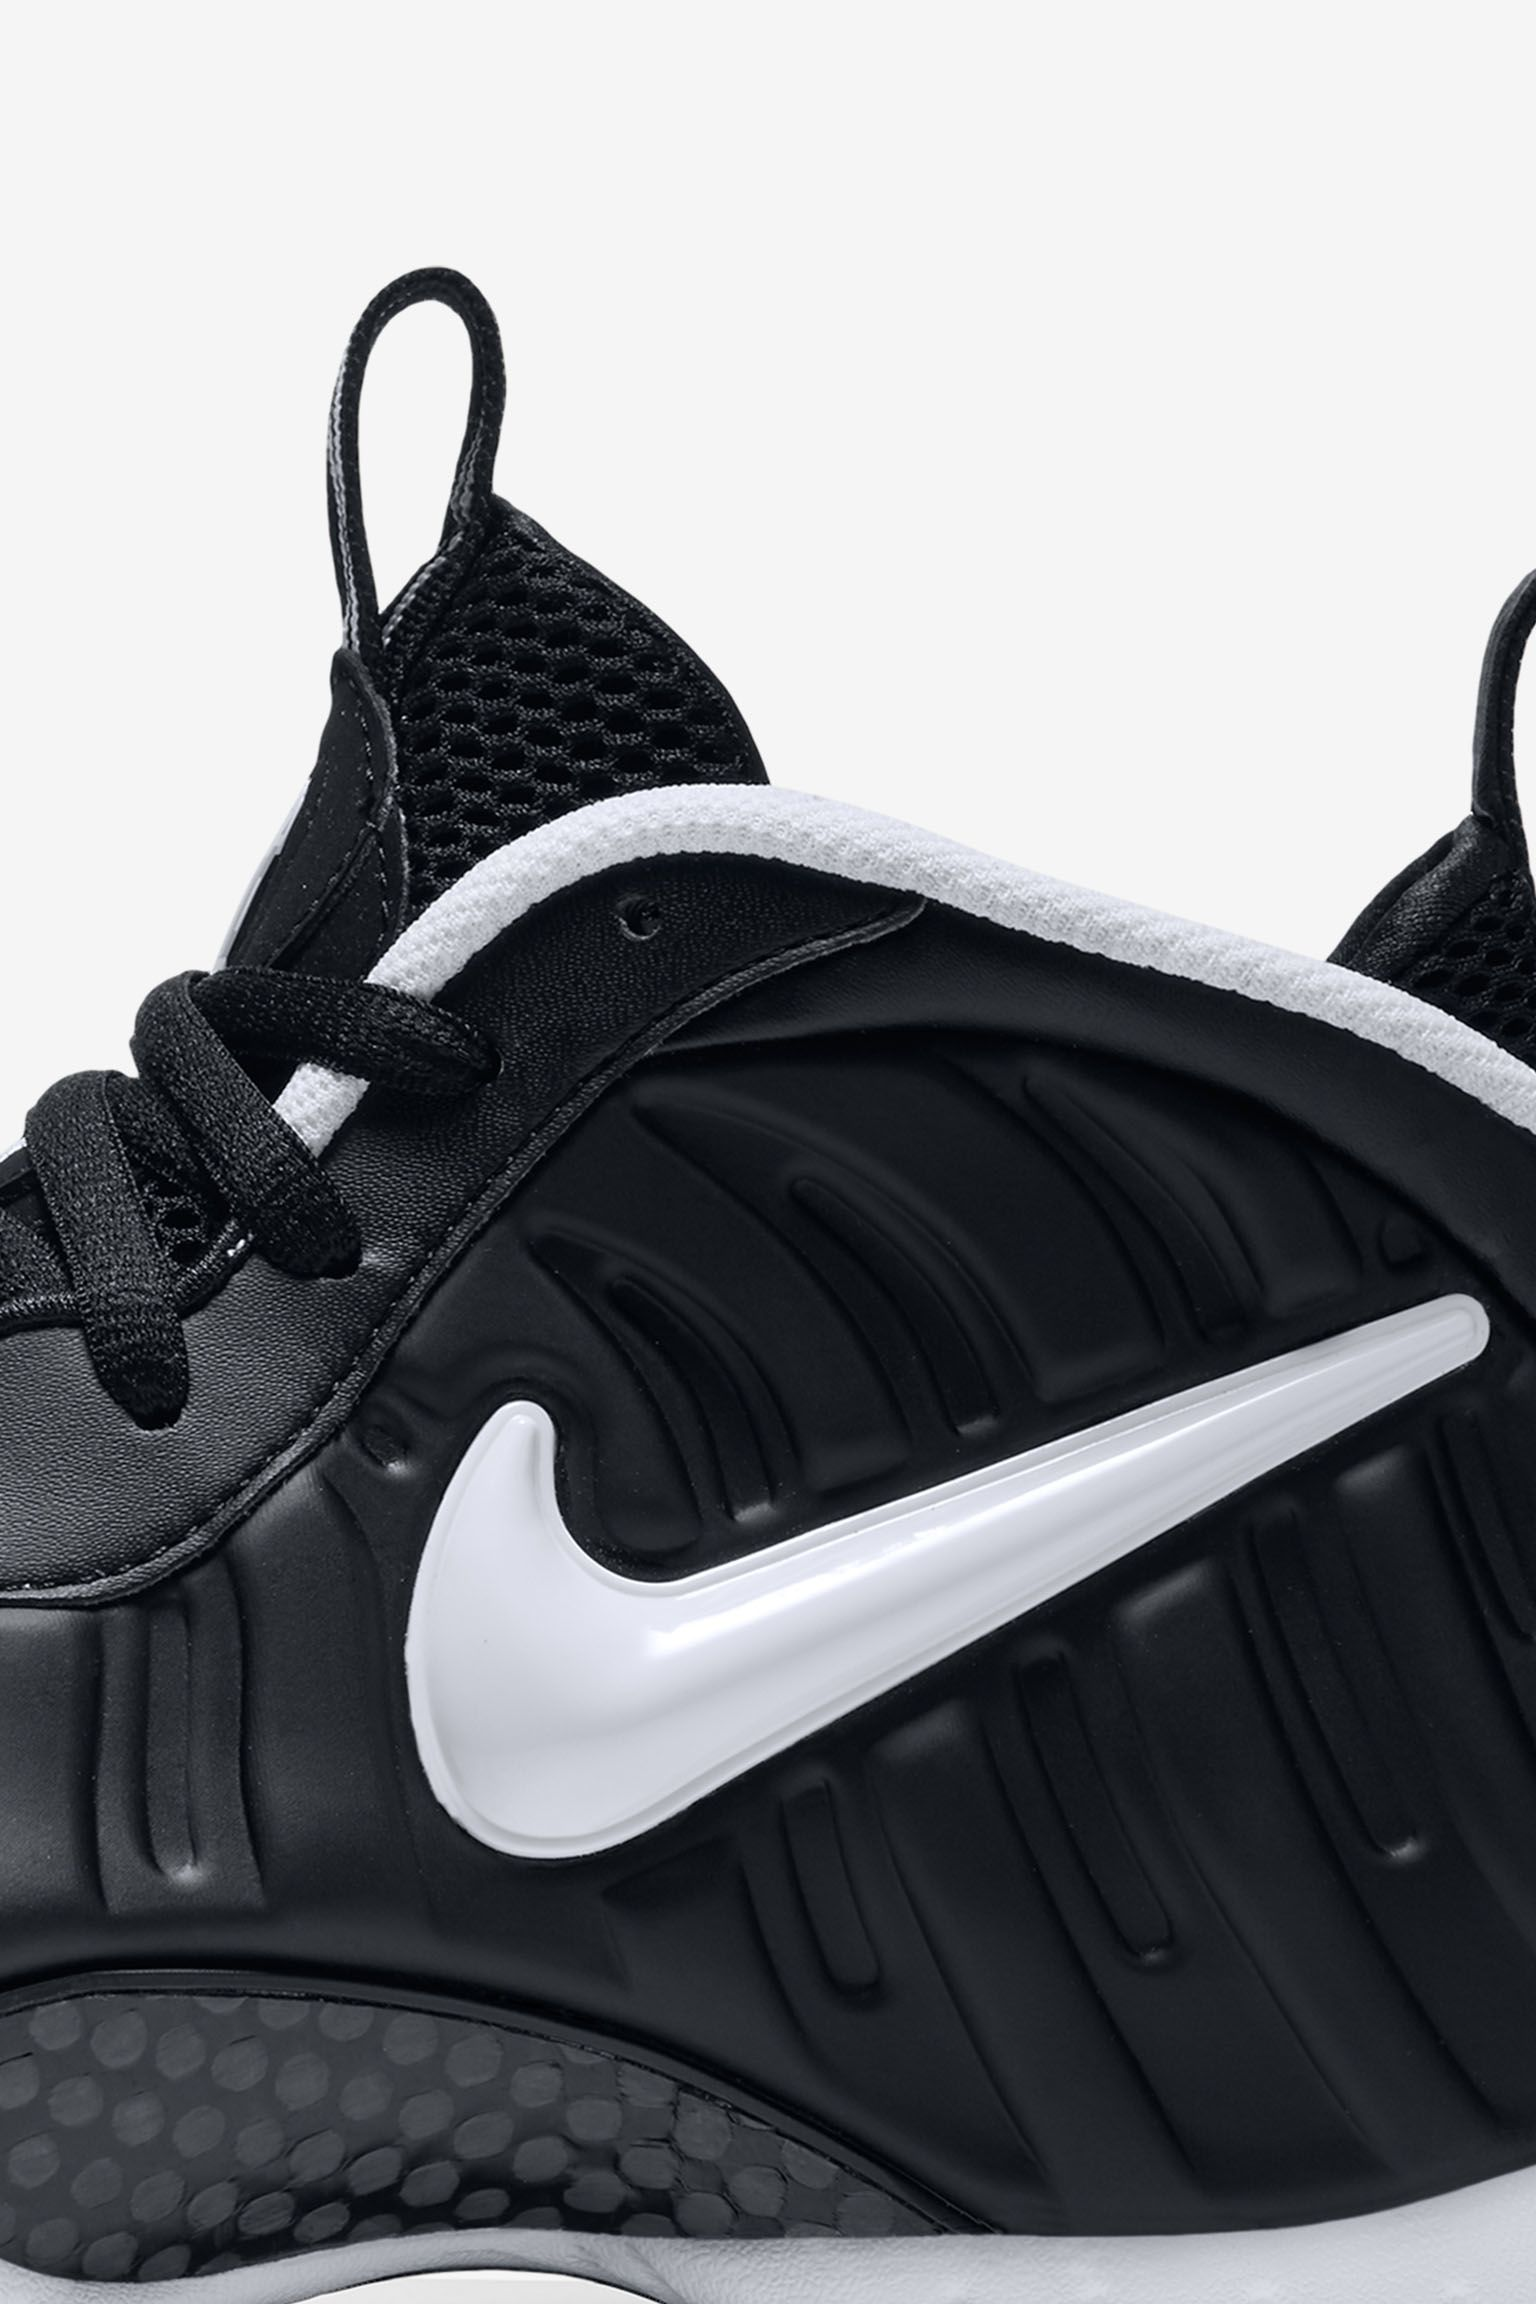 Nike Air Foamposite Pro 'Black & White' 2016